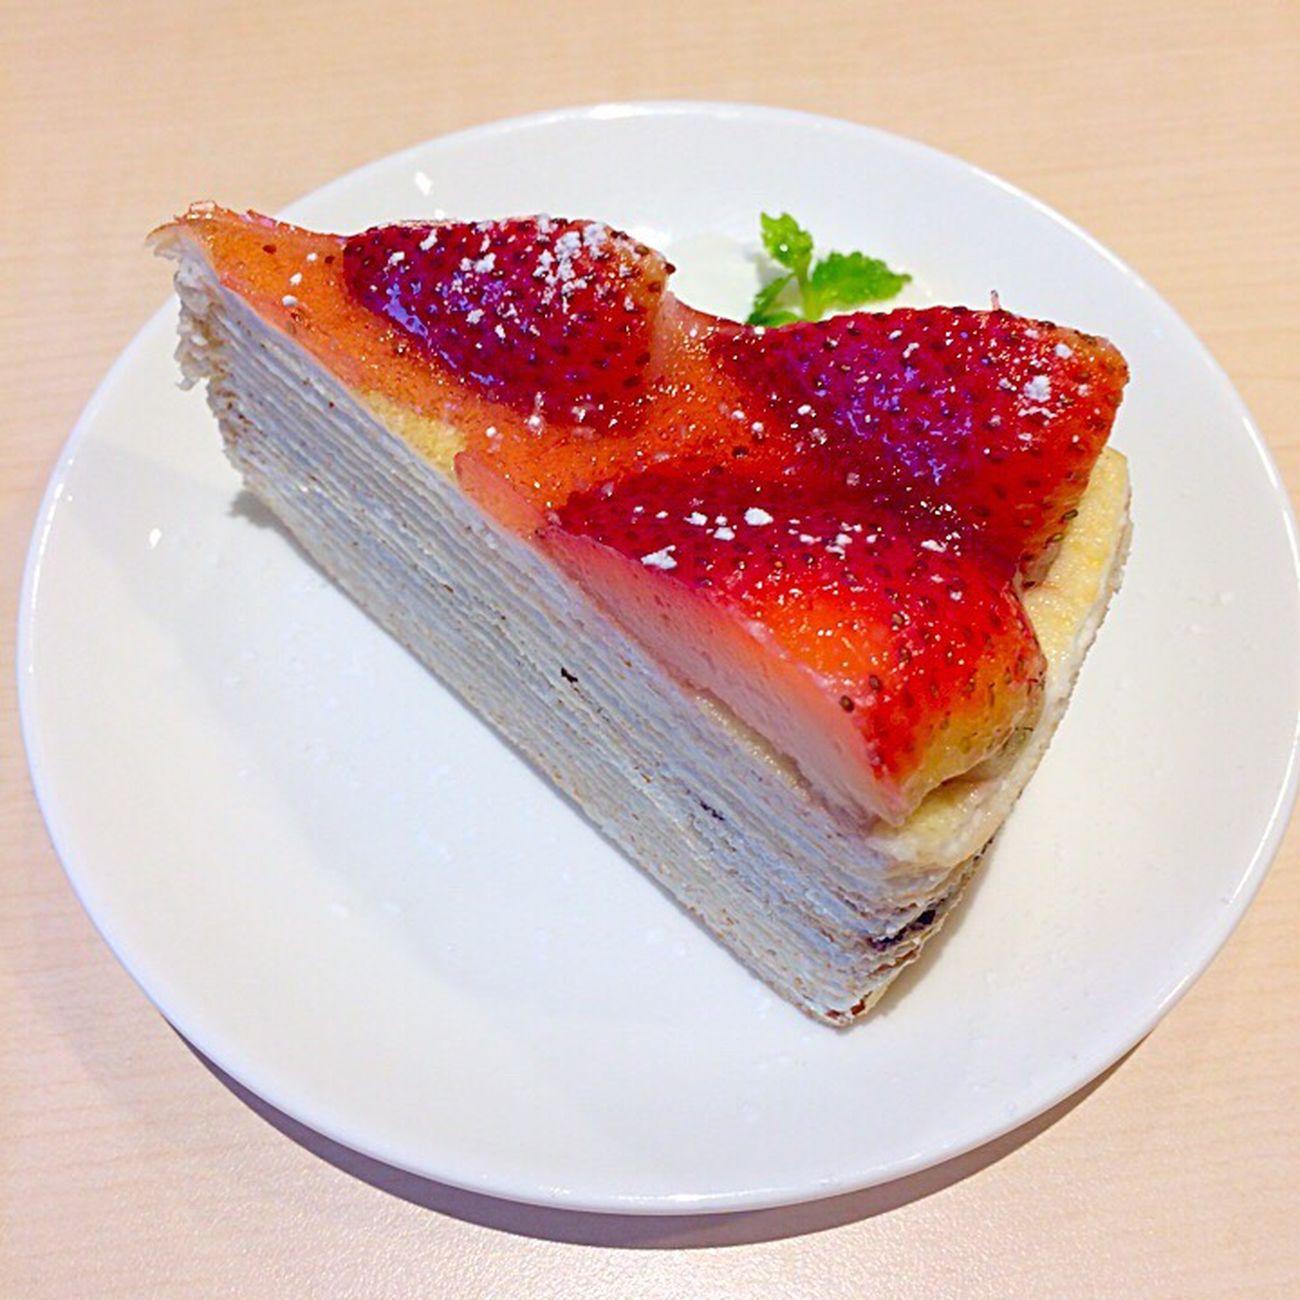 Cake Crape Cake dessert Enjoying A Meal